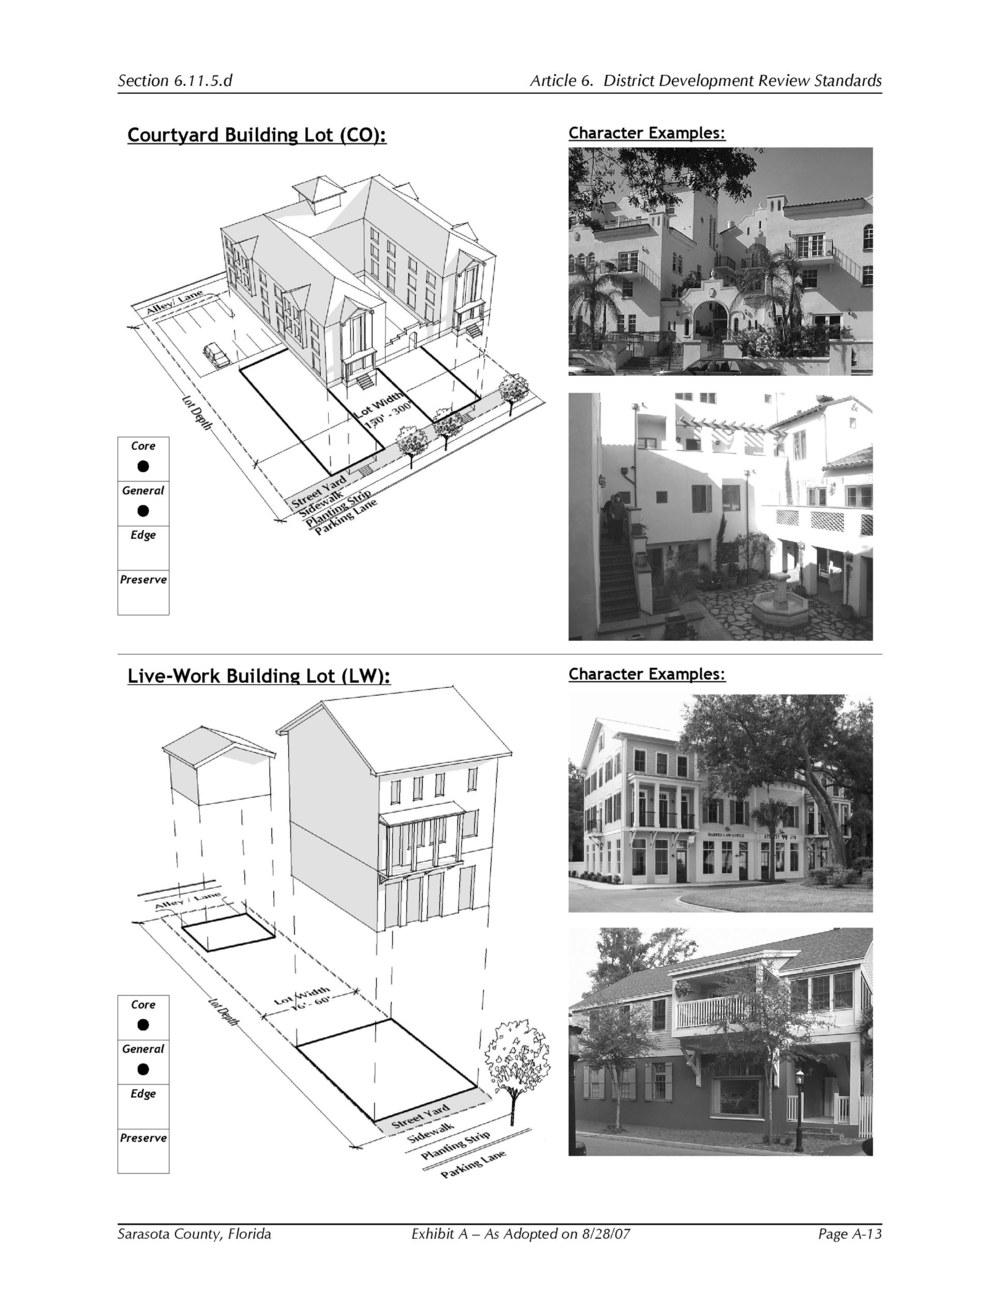 SarasotaCodeExhibitsABC-August28-2007higherquality_Page_13.jpg